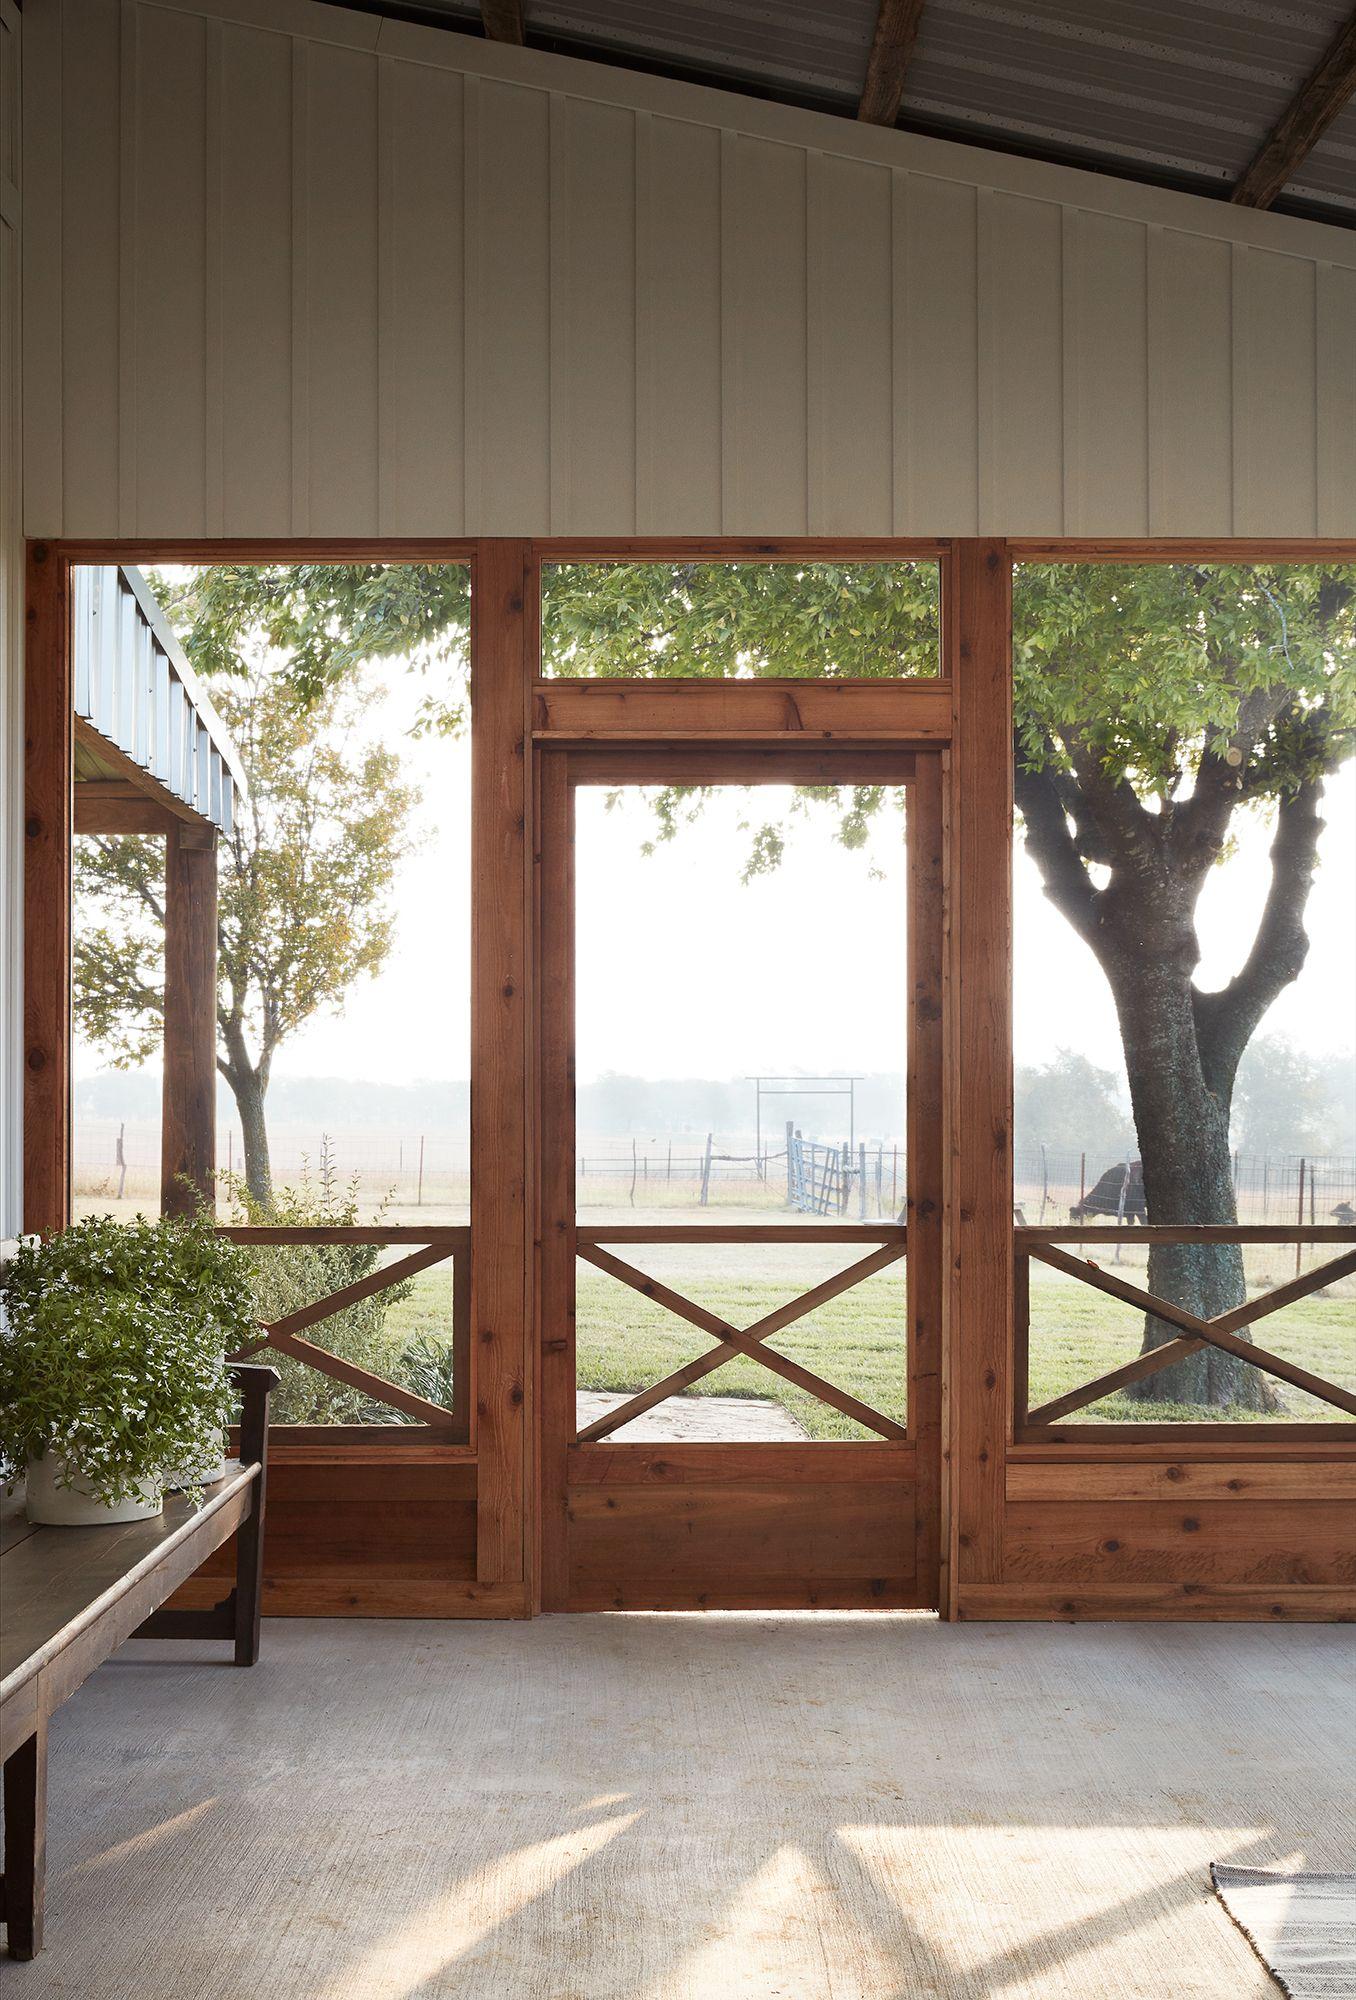 Episode 14 Season 5 Hgtv S Fixer Upper Chip Jo Gaines Porch Design Screened Porch Designs House With Porch